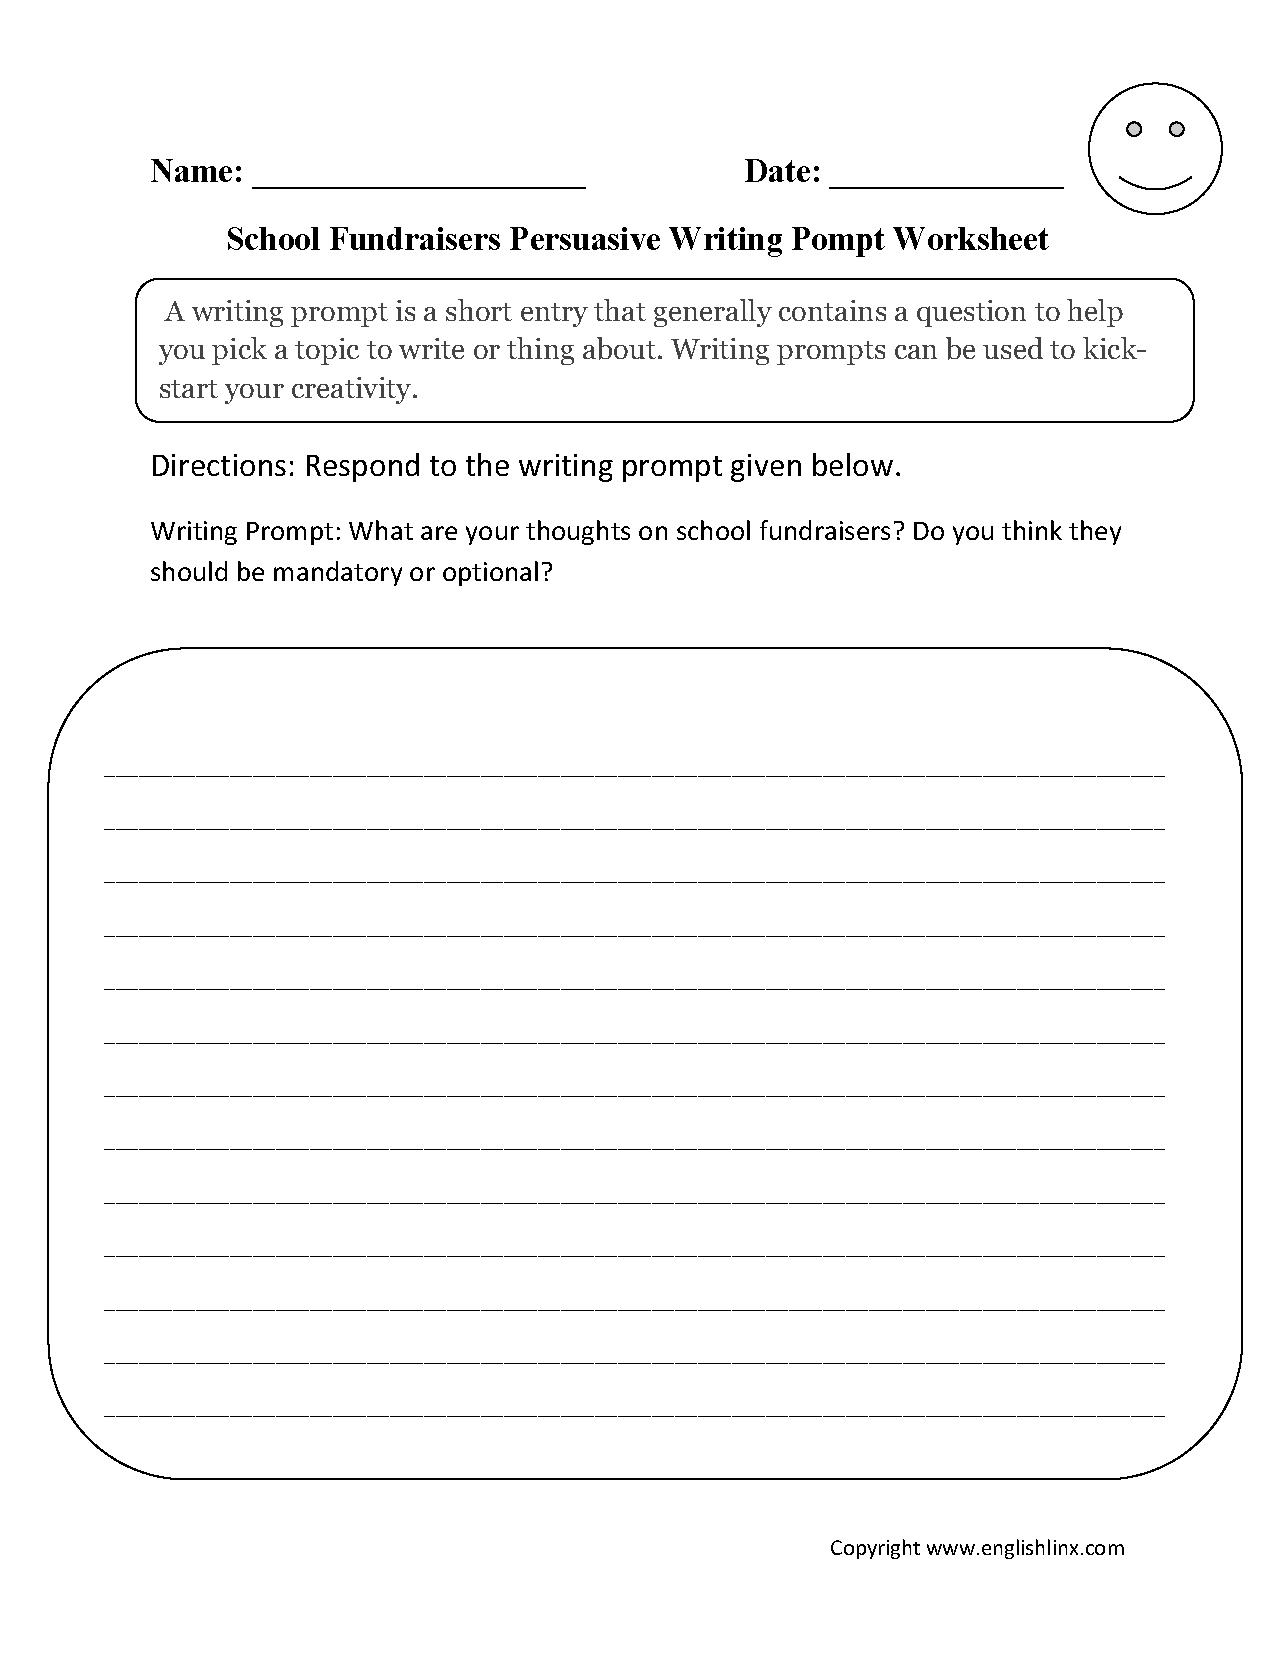 Fundraisers Persuasive Writing Prompt Worksheet